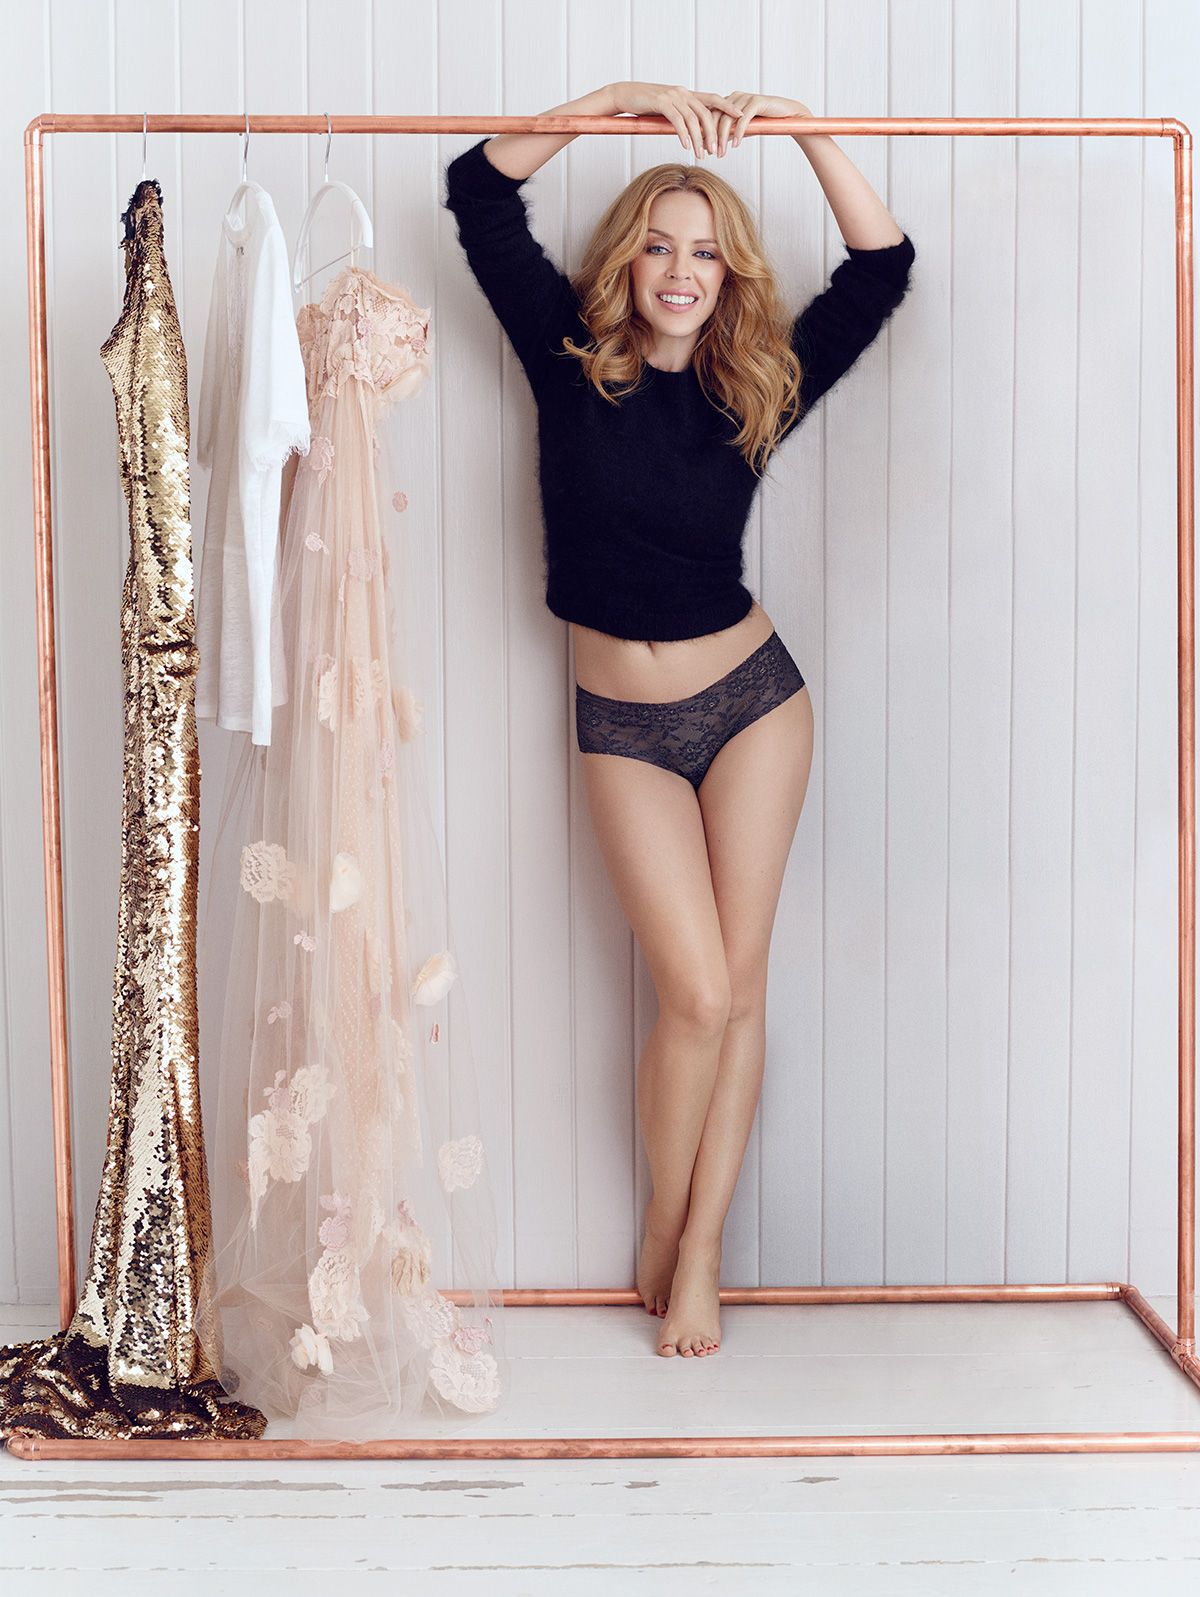 Kylie minogue lingerie advert 3